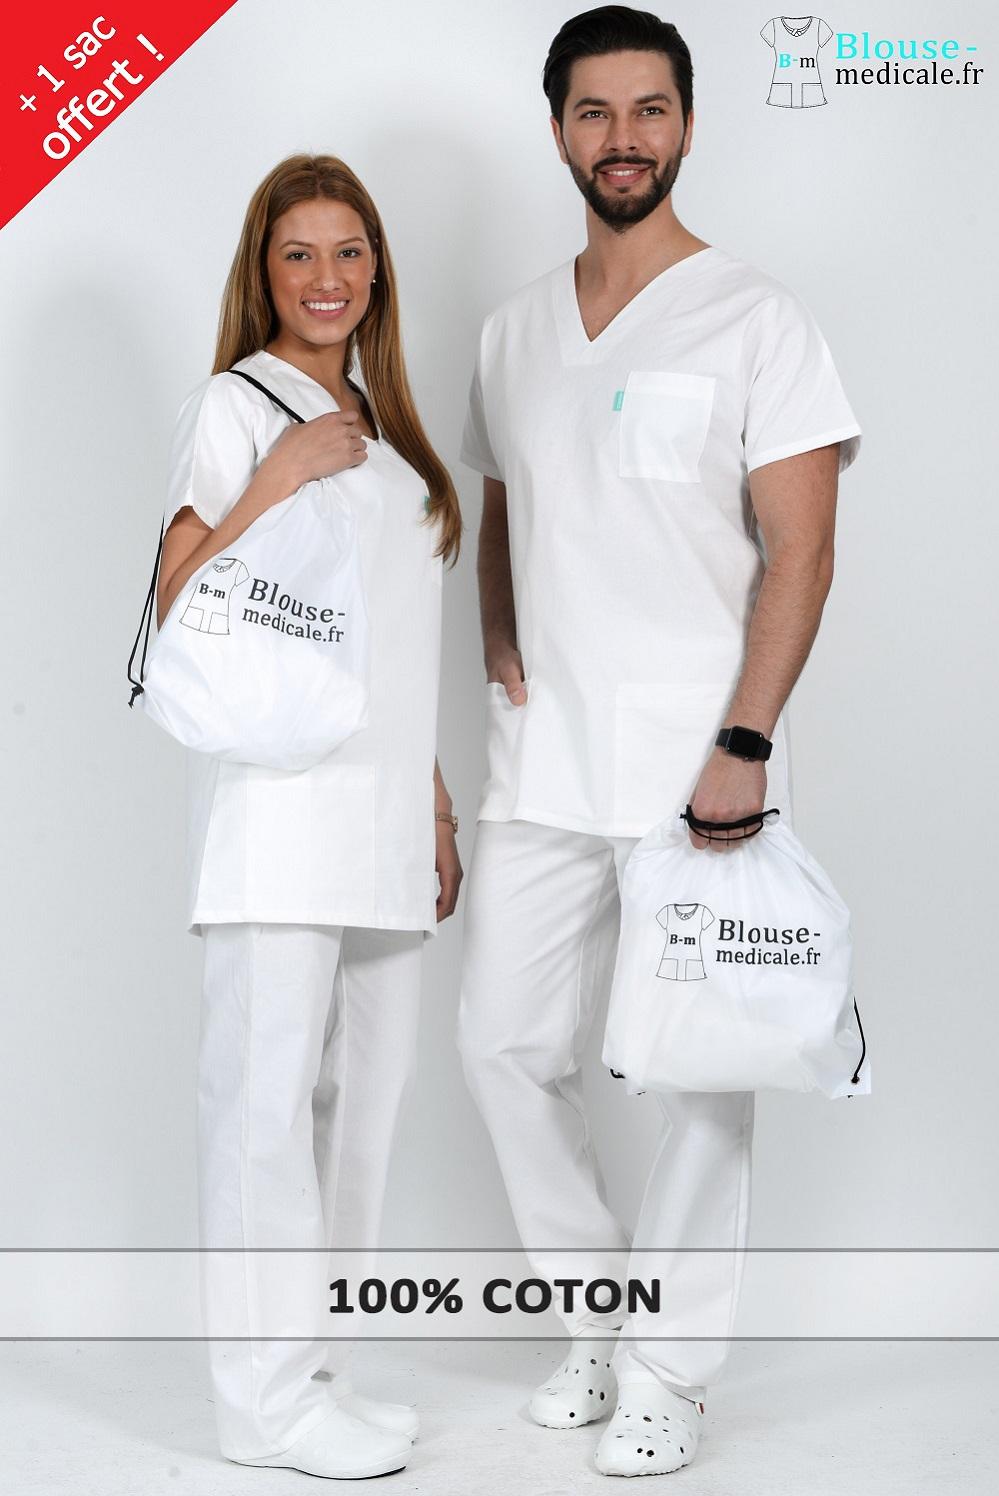 tenue medicale homme tenue hopital tenue kiné tenue étudiant medecine